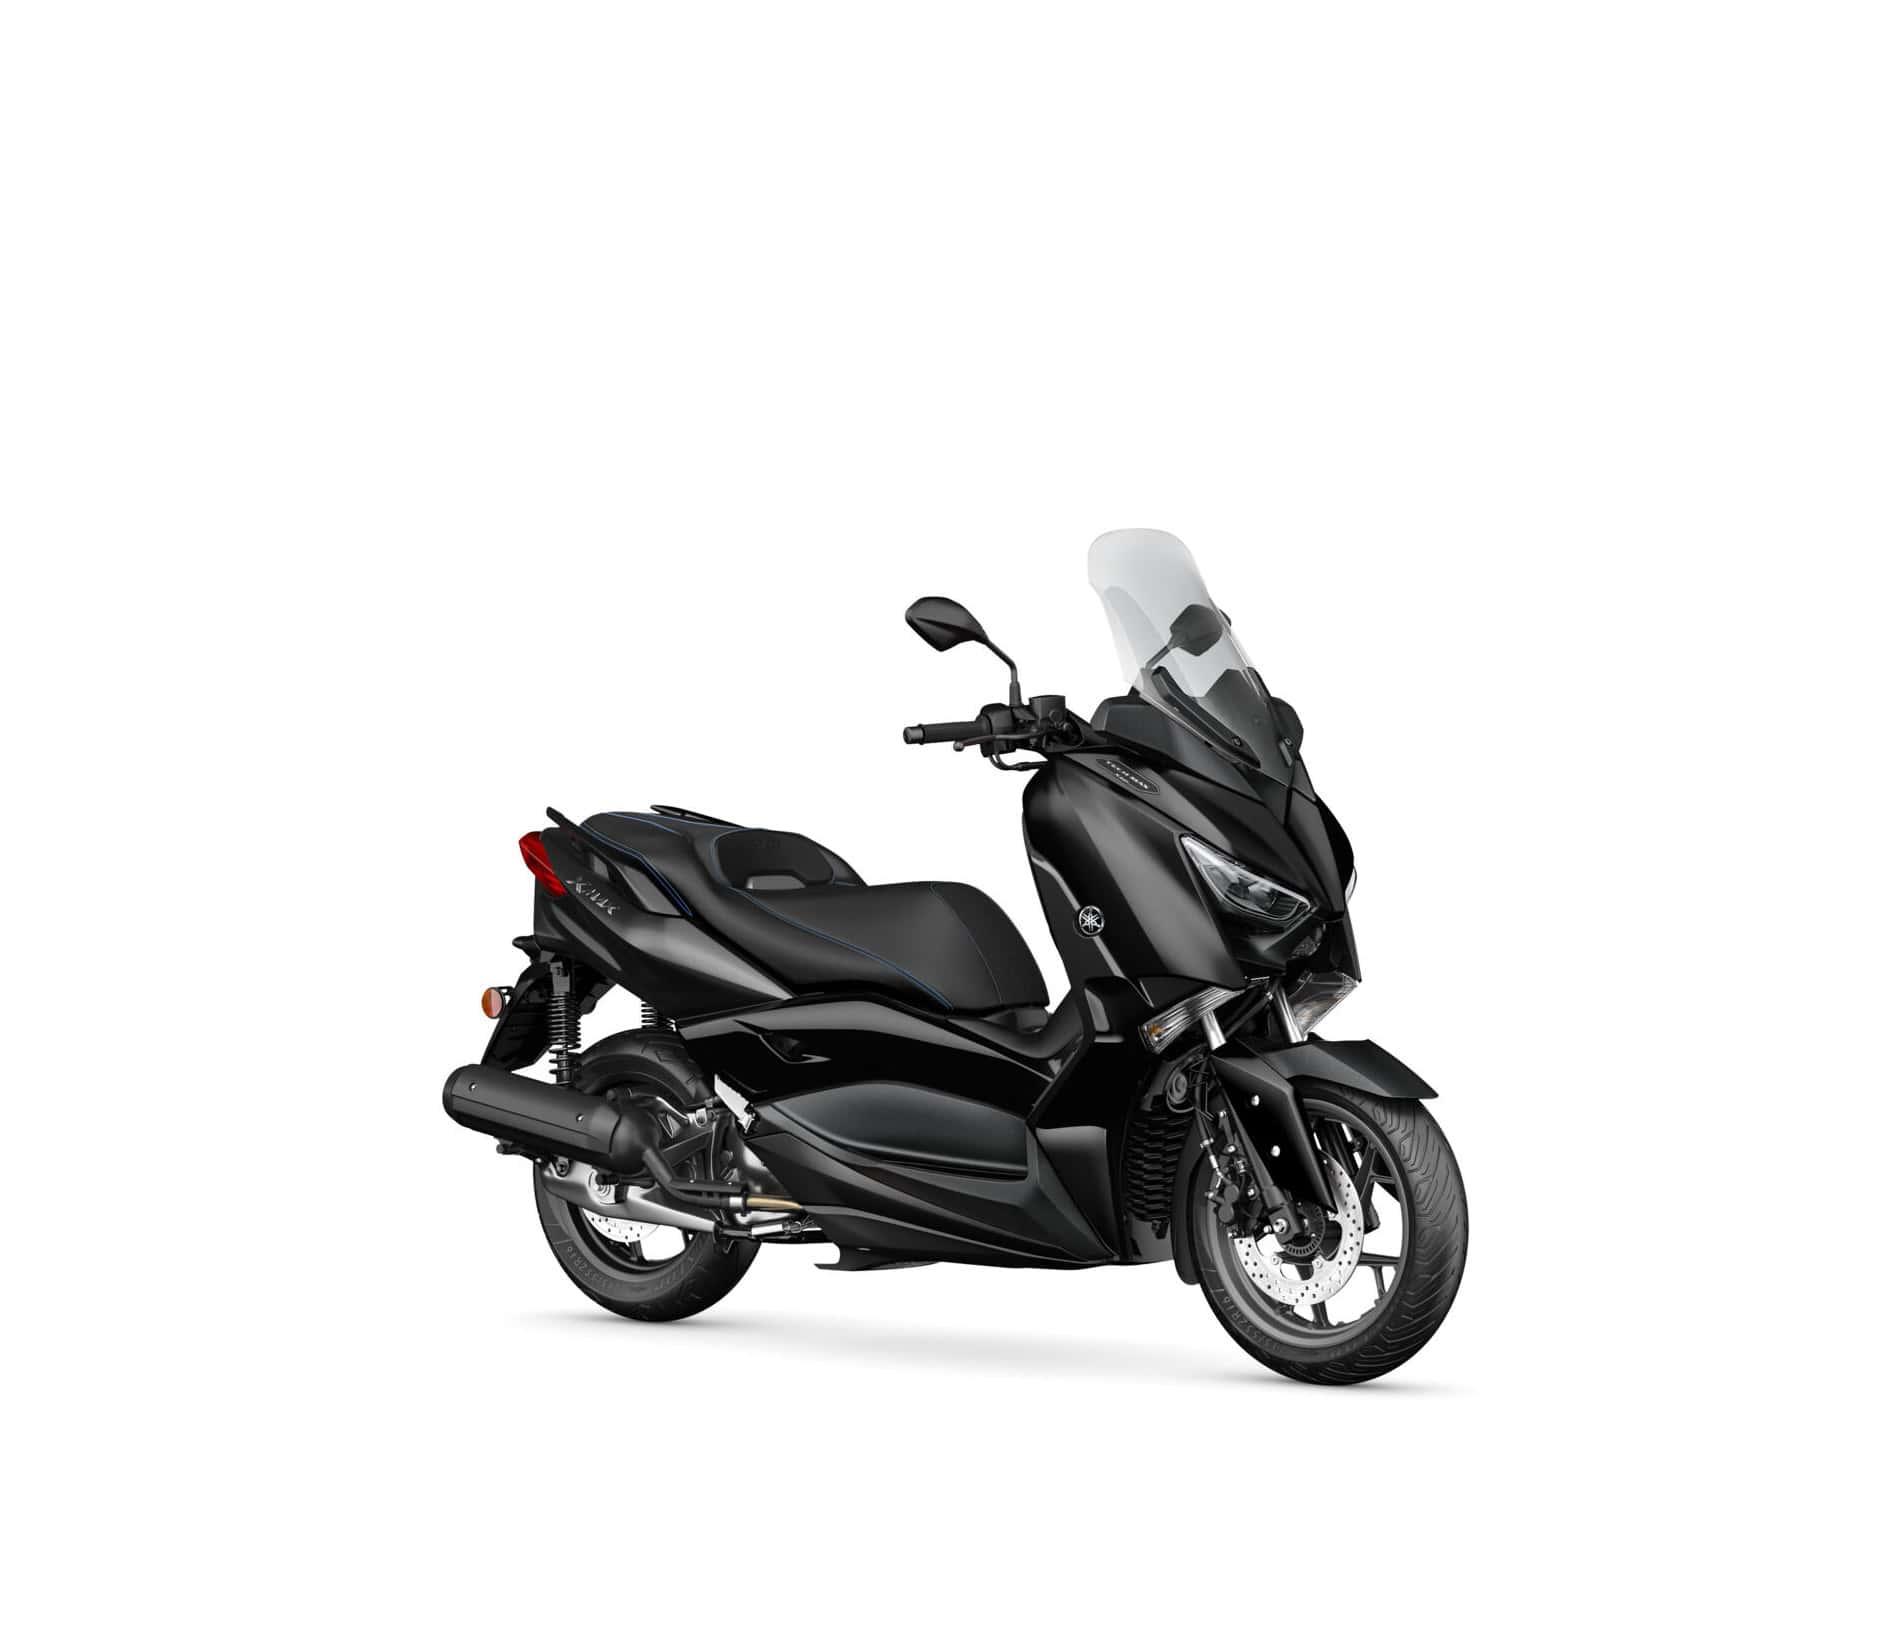 125 yamaha xmax 125 tech max chelsea motorcycles group 125cc motorcycle yamaha xmax 125 tech max chelsea